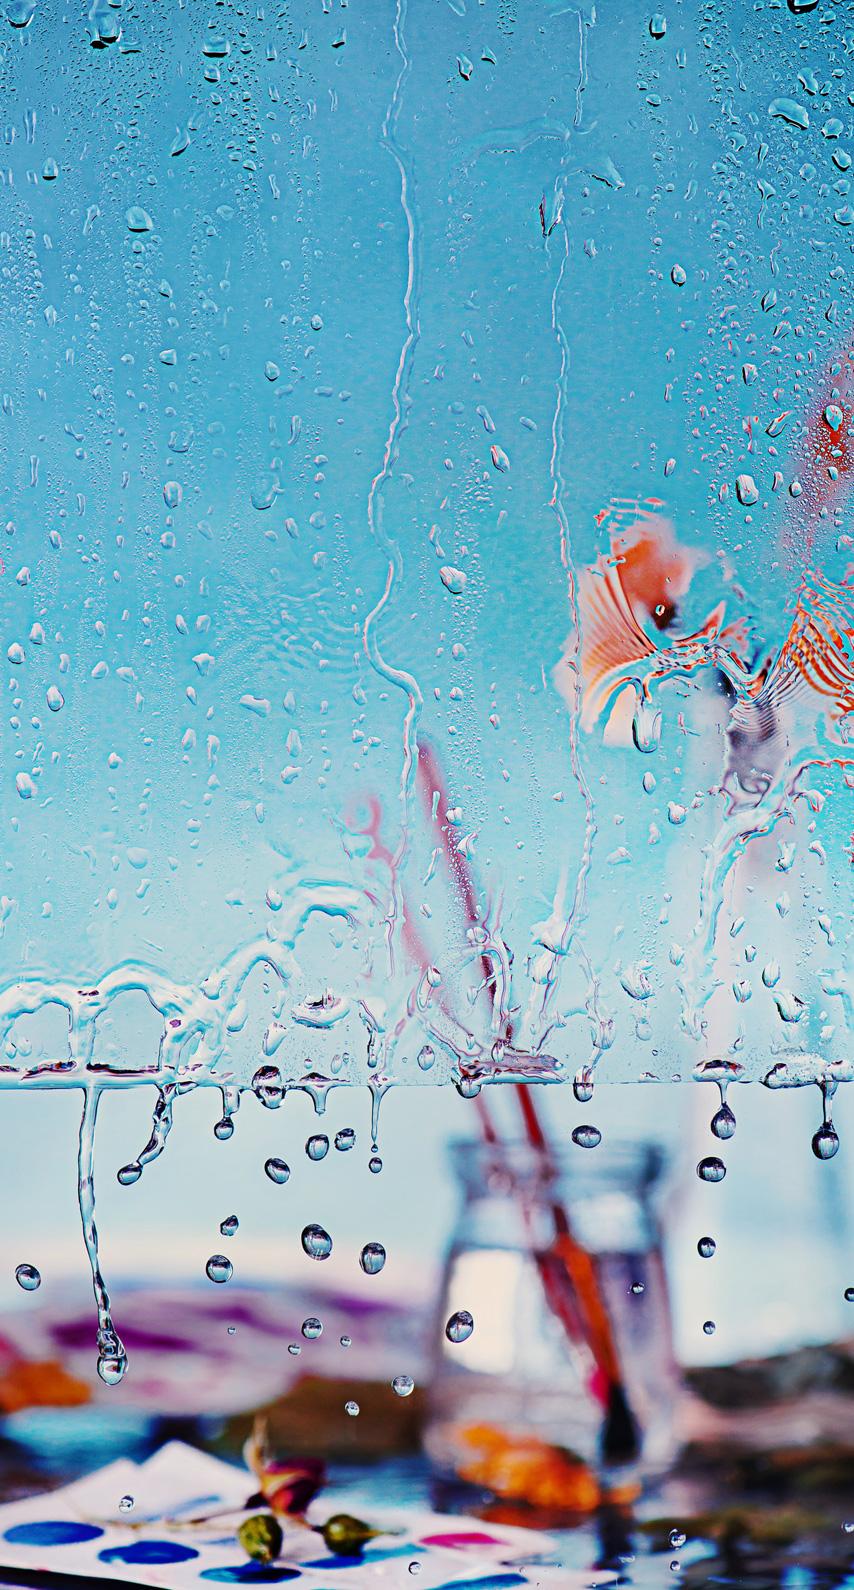 wet, ripple